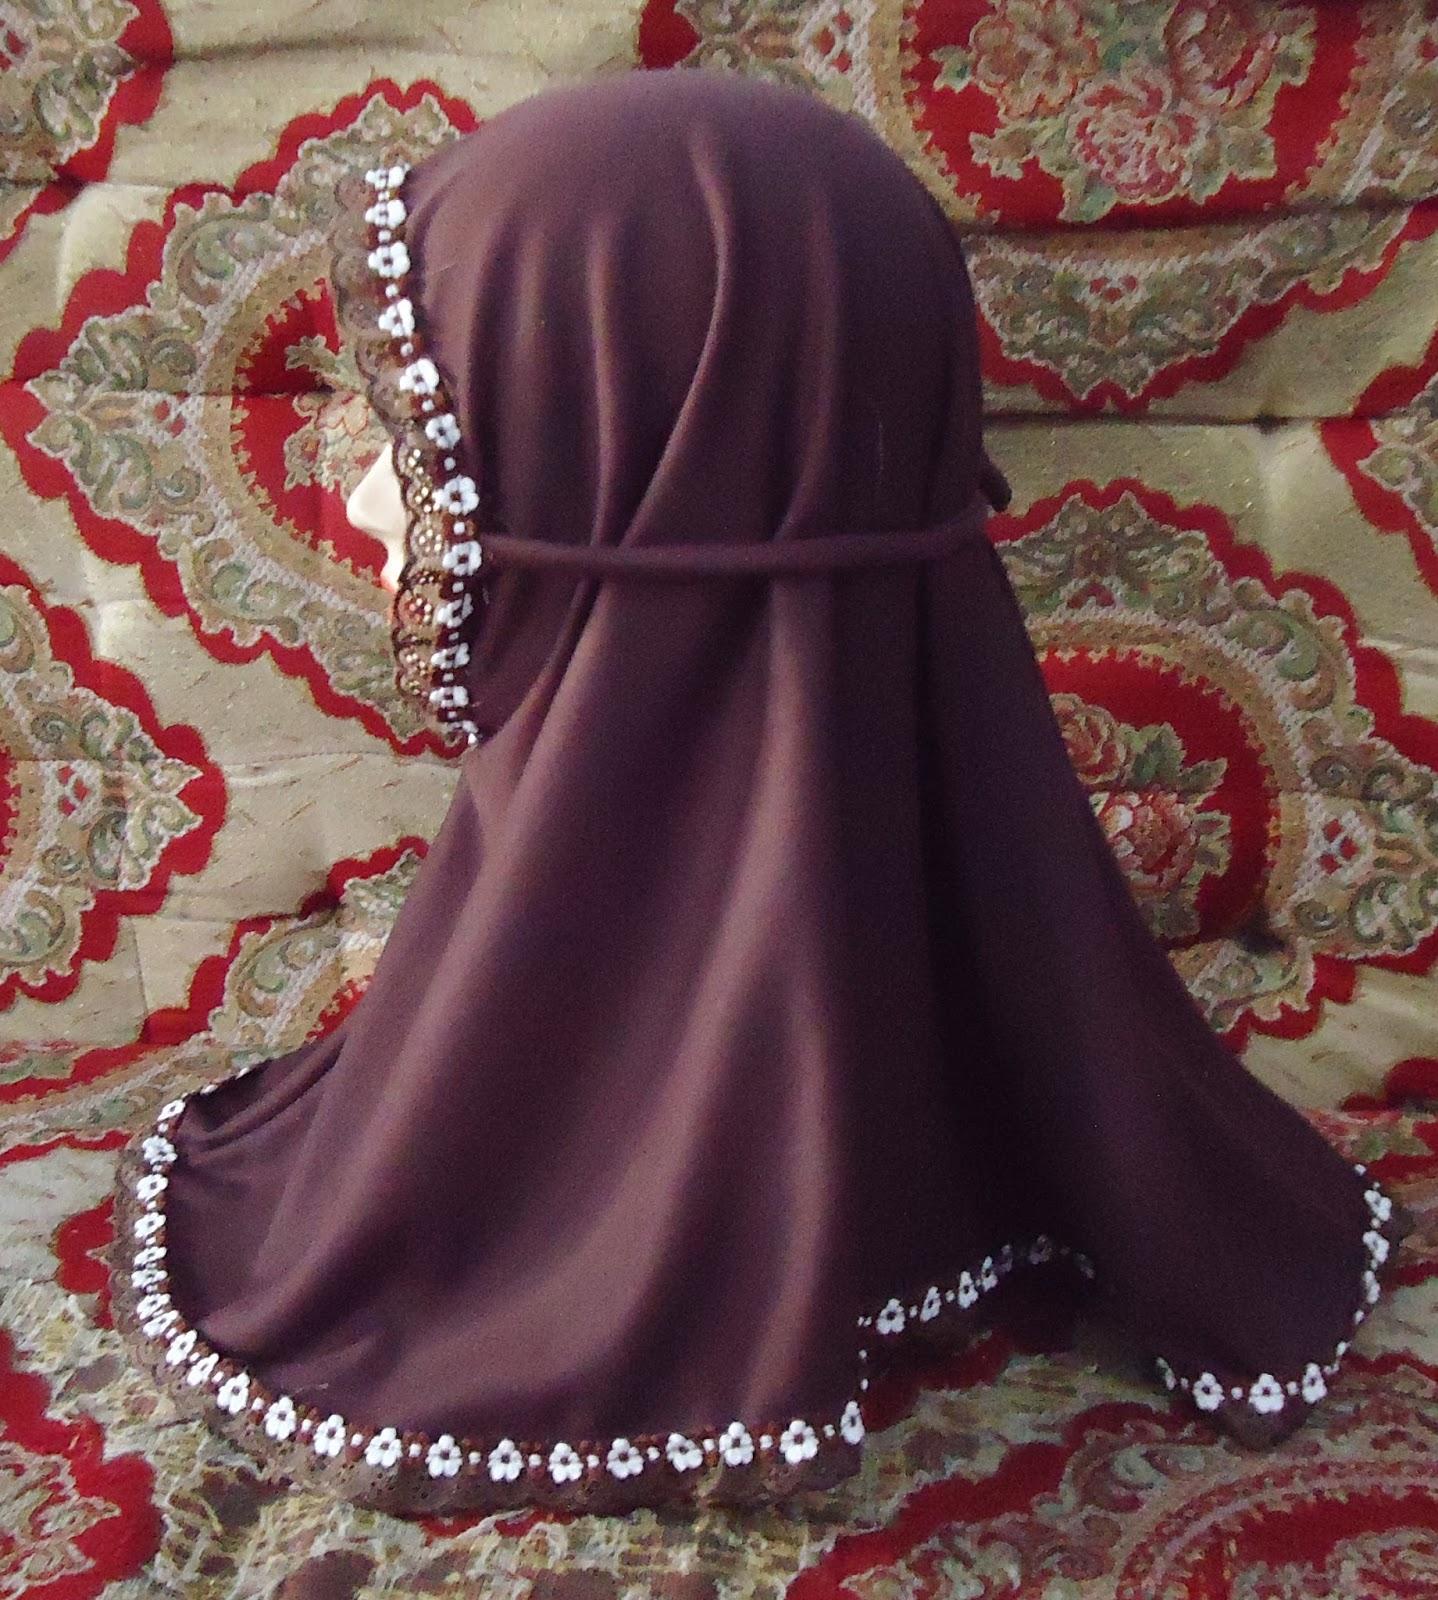 konveksi seragam sekolah murah konveksi grosir jilbab seragam sekolah ra tk sd mi smp mts. Black Bedroom Furniture Sets. Home Design Ideas